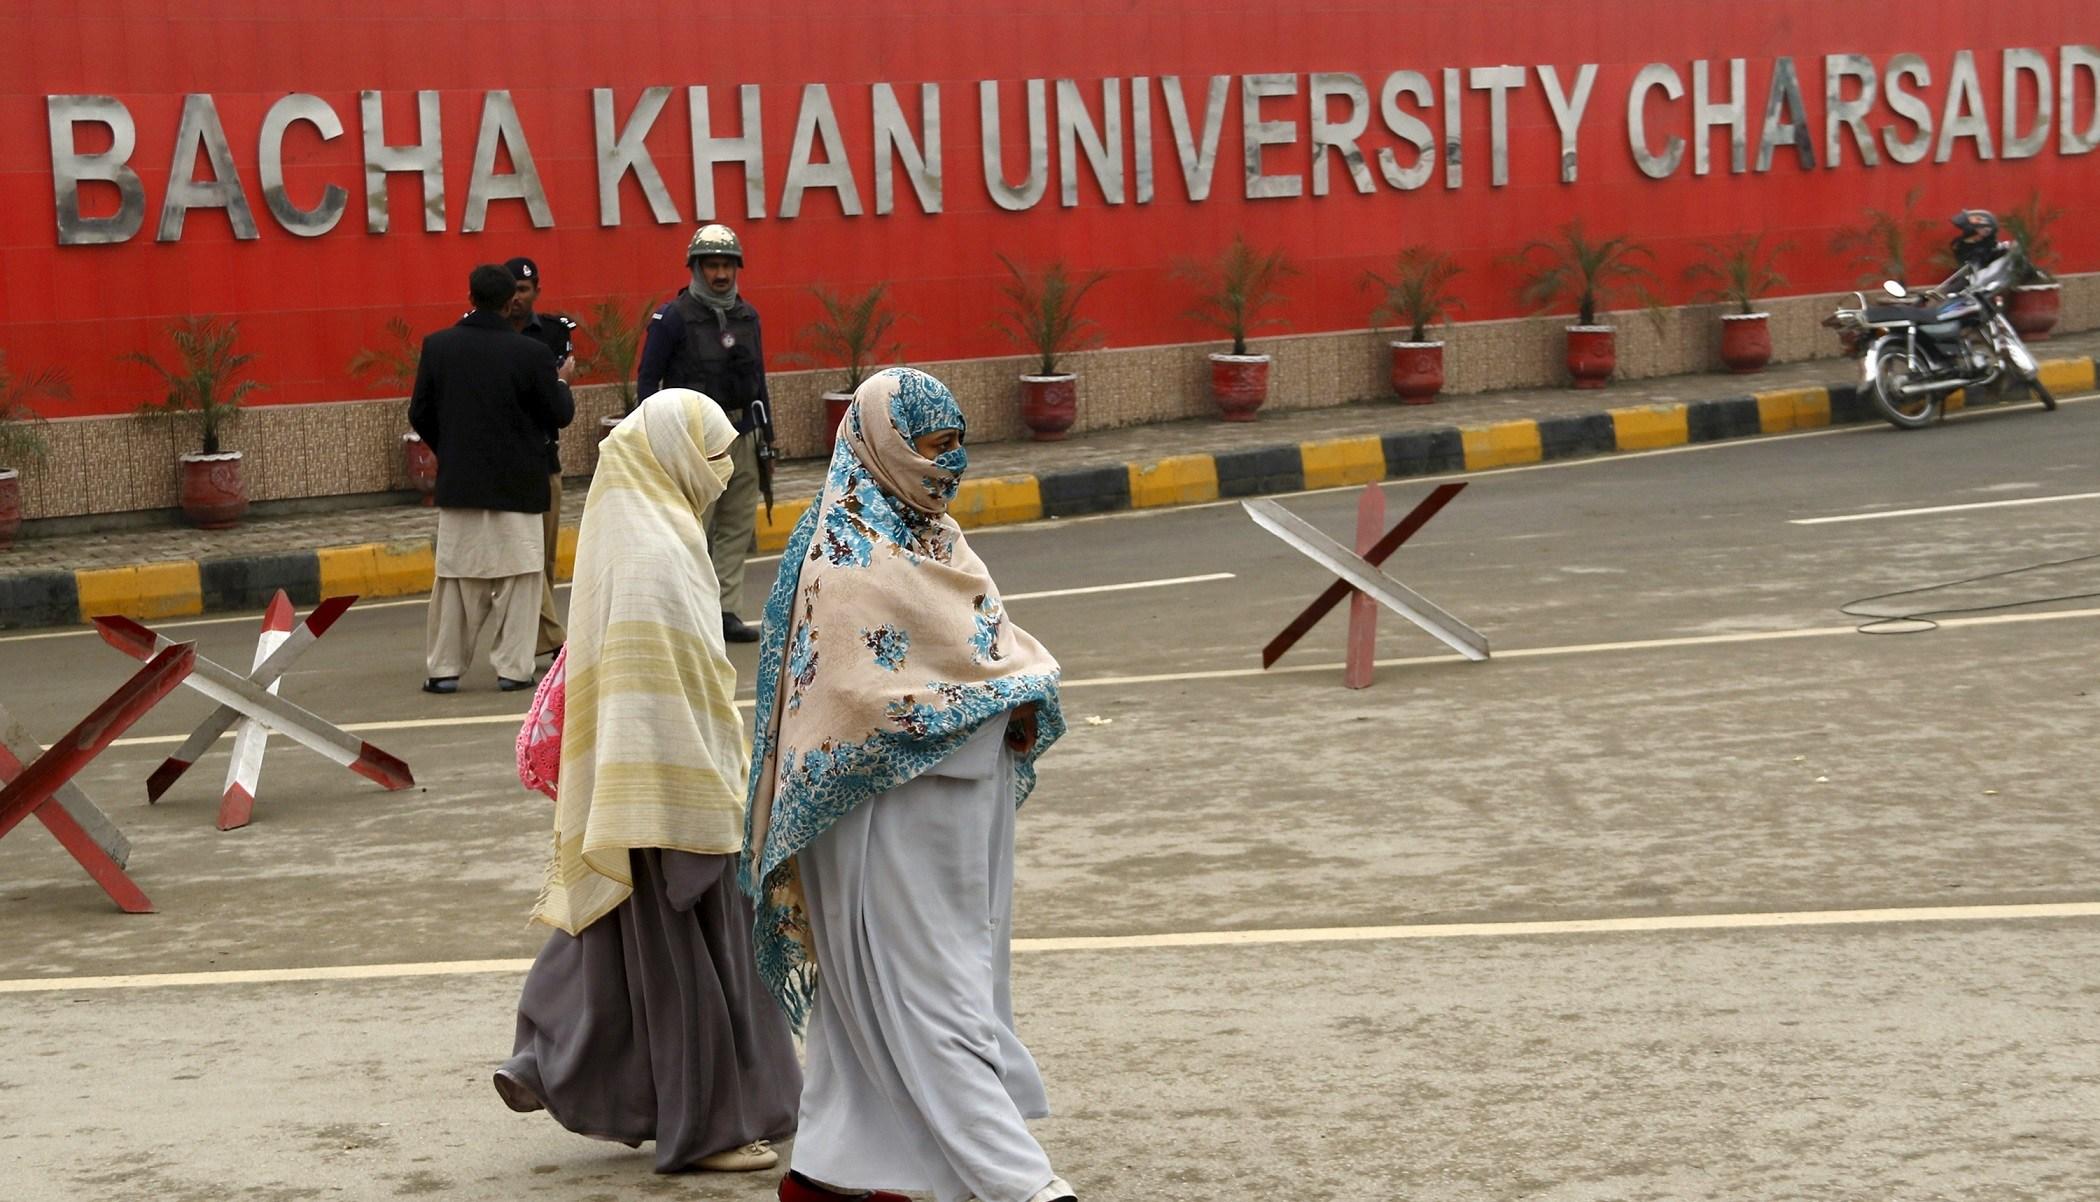 Students leave their campus at Bacha Khan University in Charsadda, Pakistan January 25, 2016. REUTERS/Khuram Parvez - GF20000106219